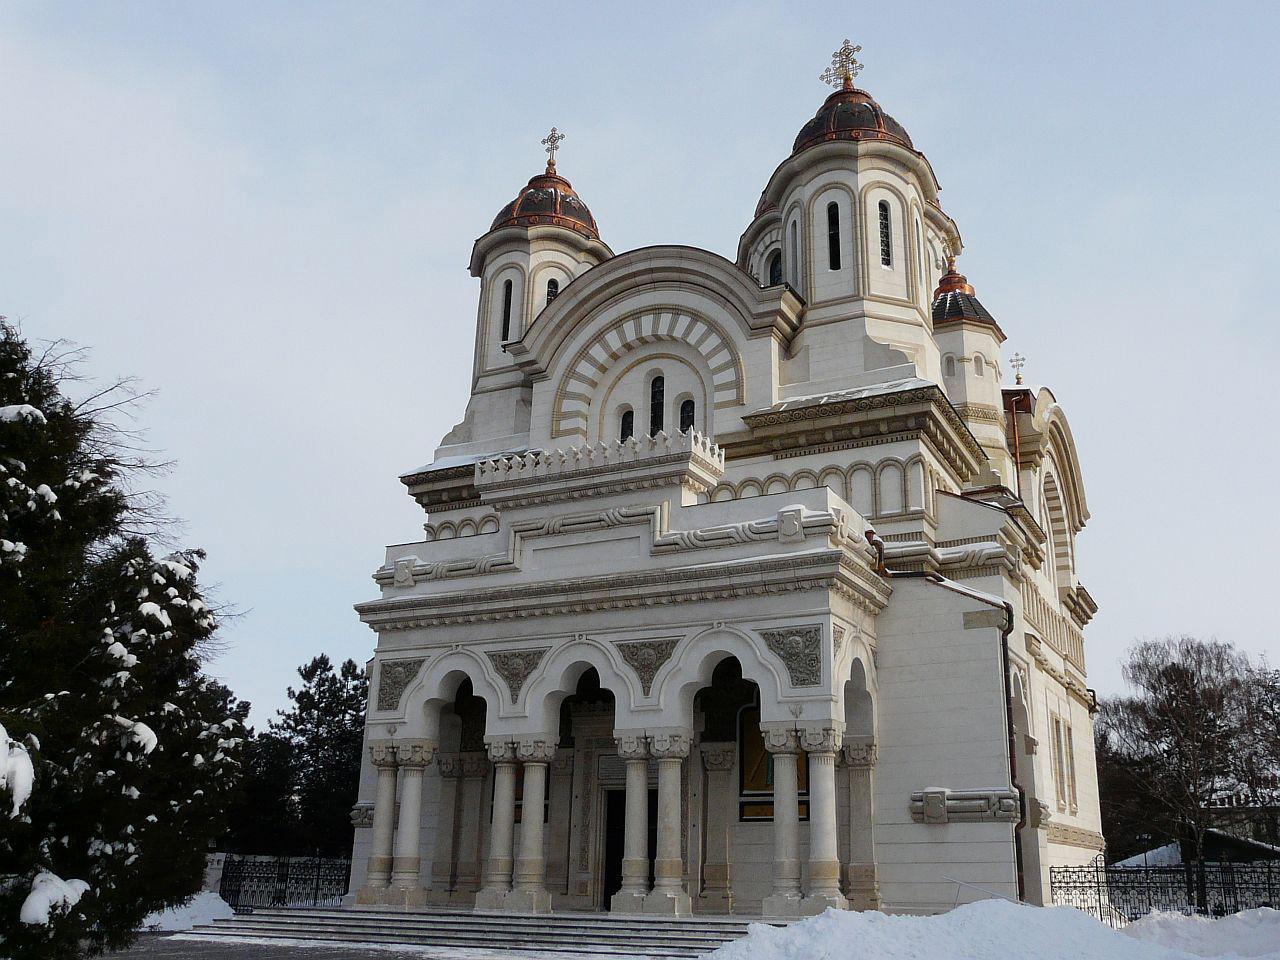 Catedrala Arhiepiscopala Sf. Andrei din Galati, 1906-1917